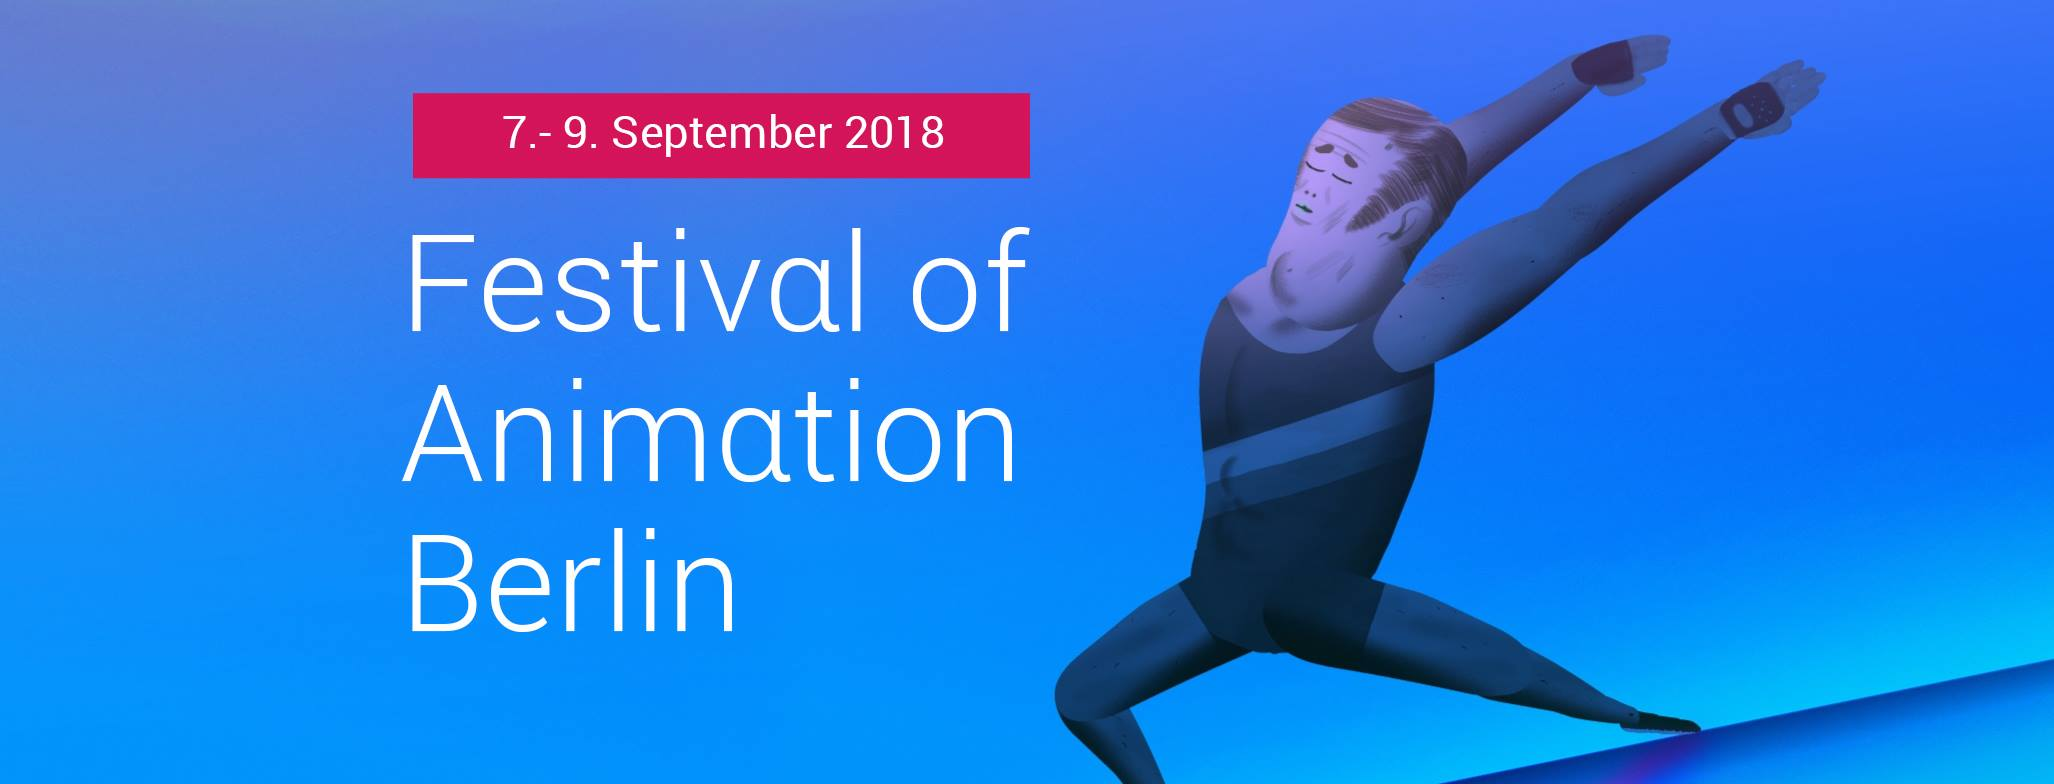 Festival of Animation Berlin 2018 | FAB 2018